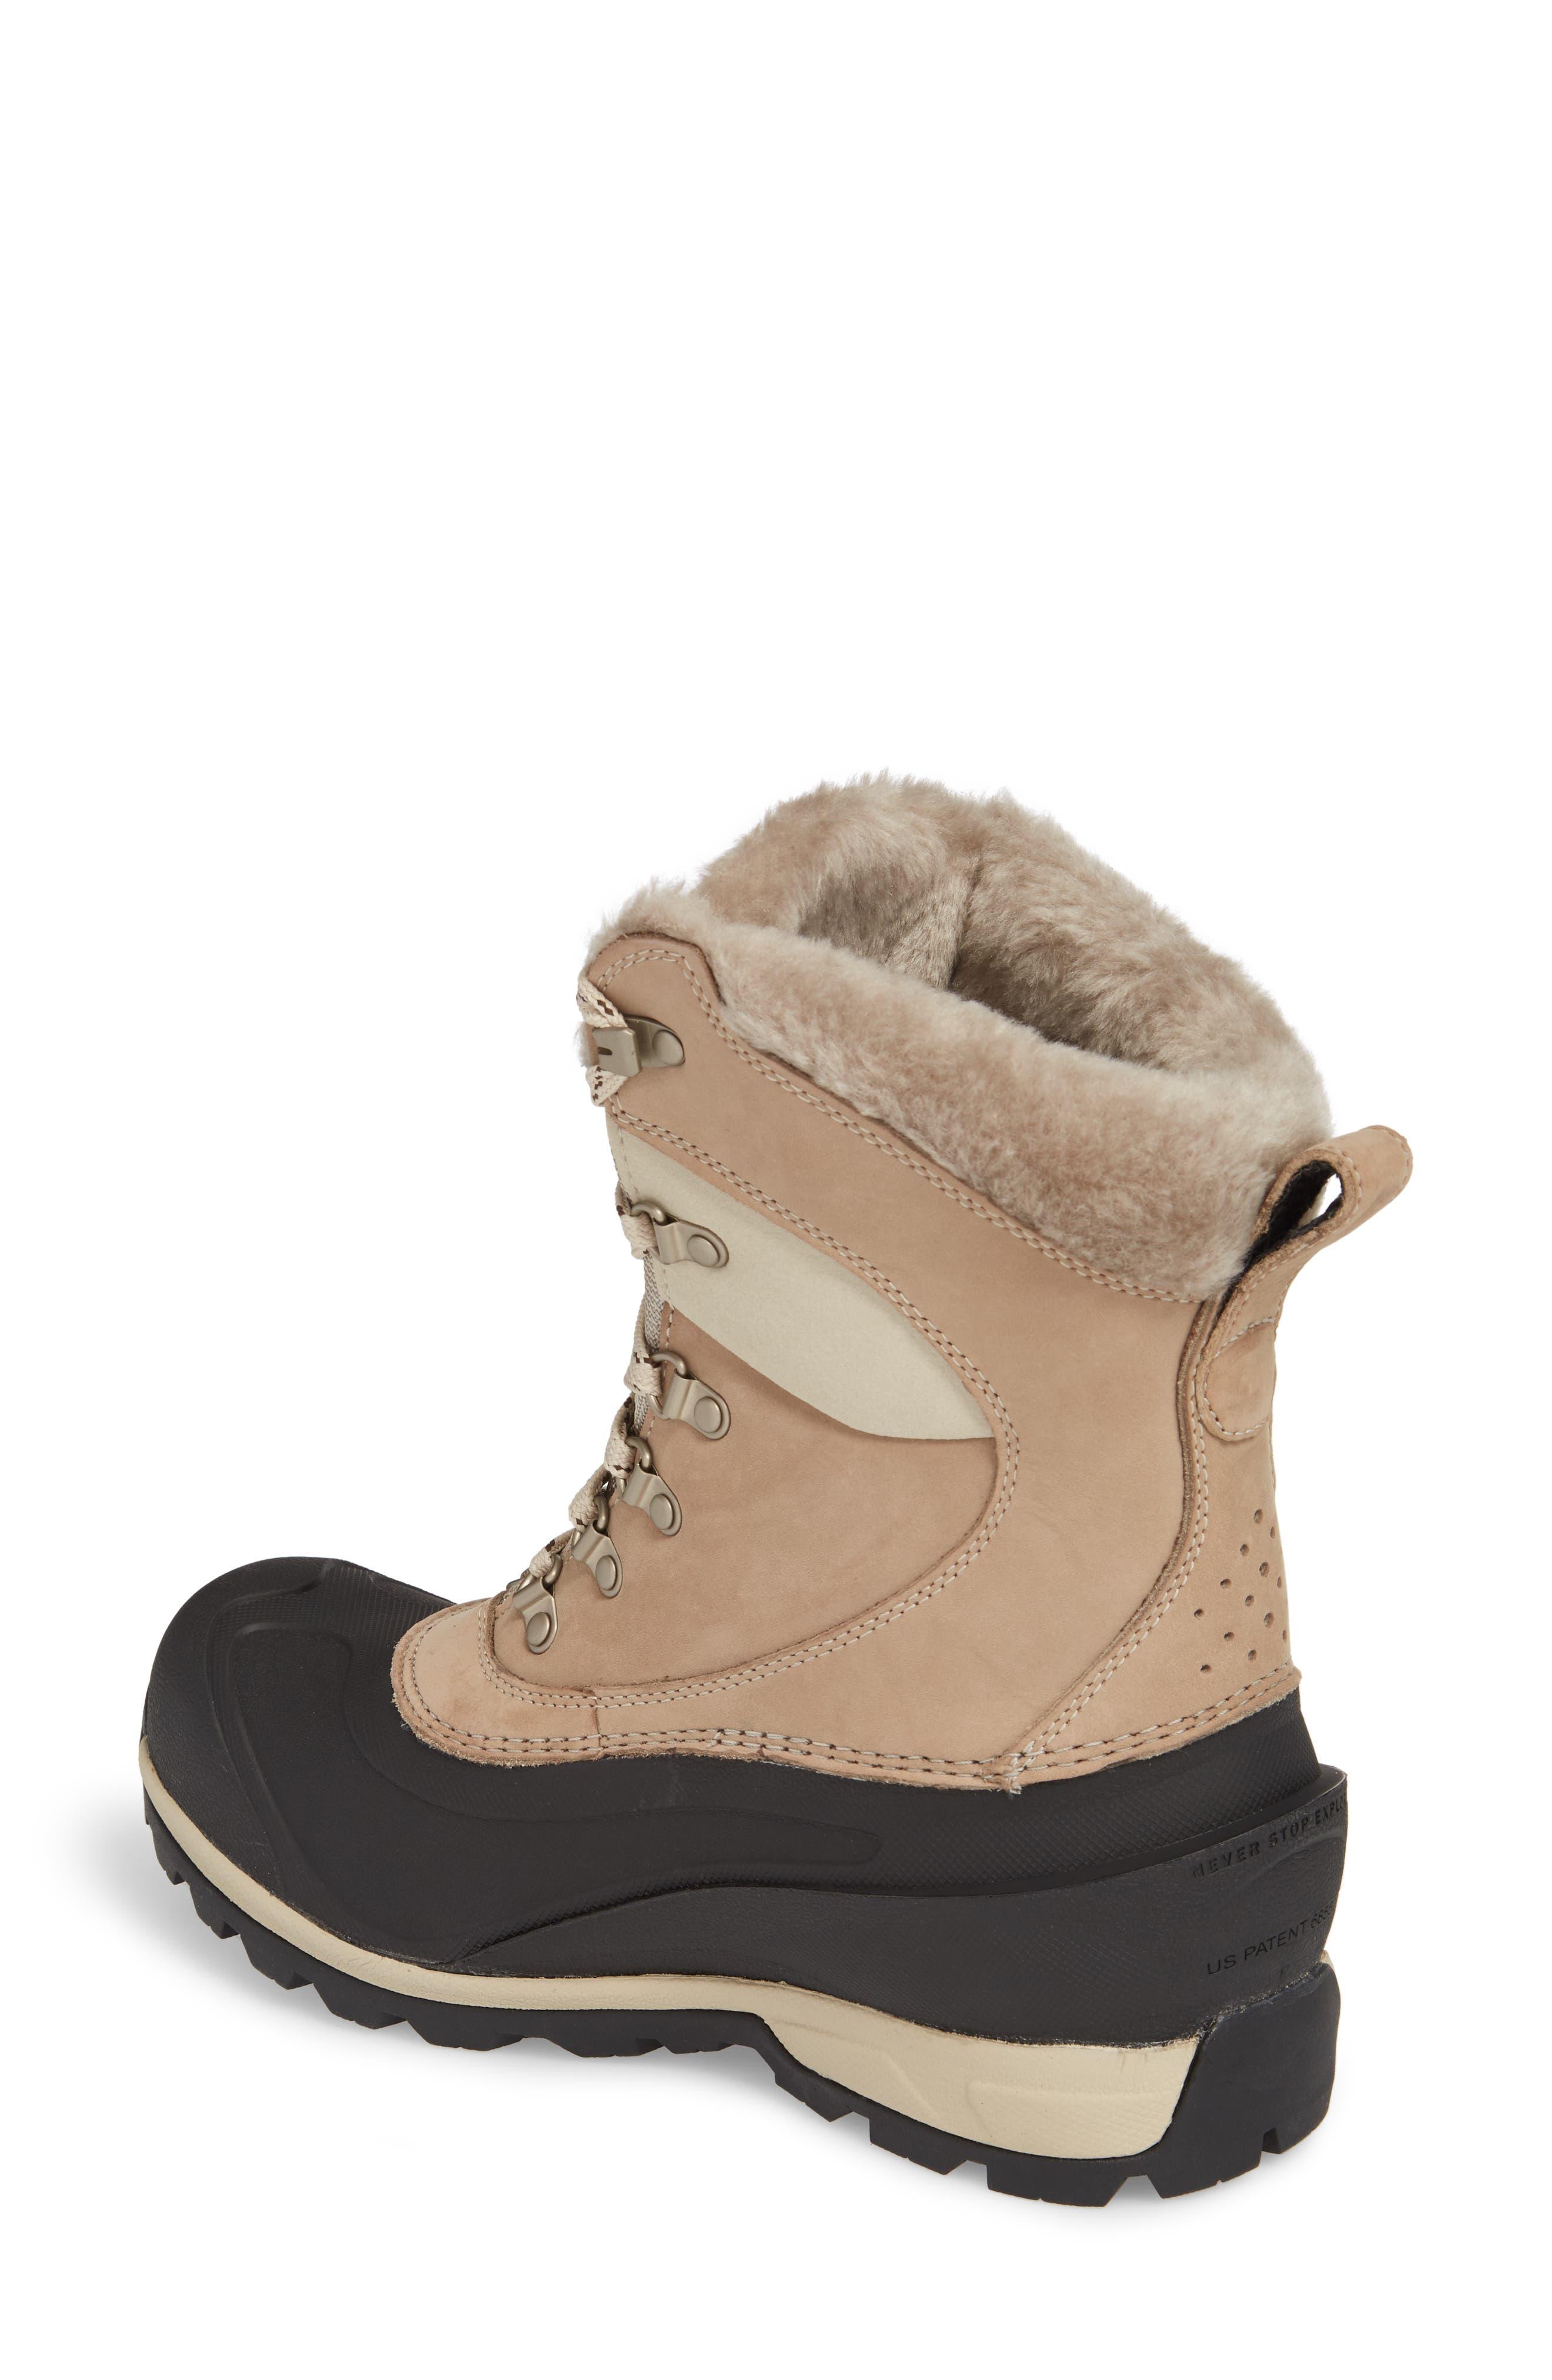 'Chilkat 400' Waterproof PrimaLoft<sup>®</sup> Insulated Boot,                             Alternate thumbnail 5, color,